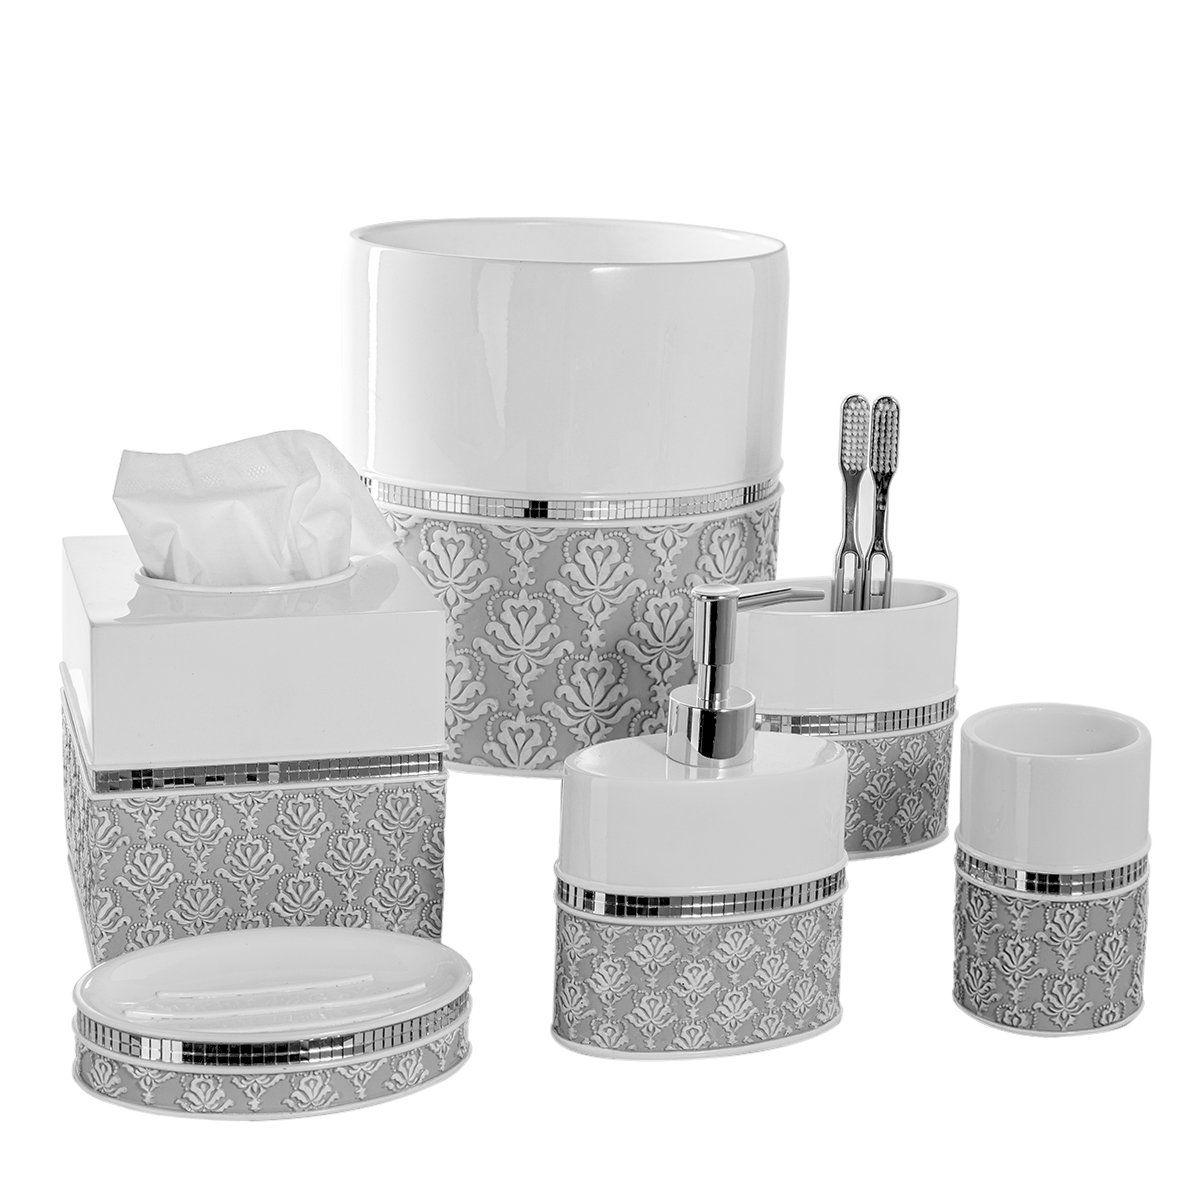 Creative Scents Mirror Damask 6 Piece Bathroom Accessory Set  Includes Decorative  Soap Dispenser/